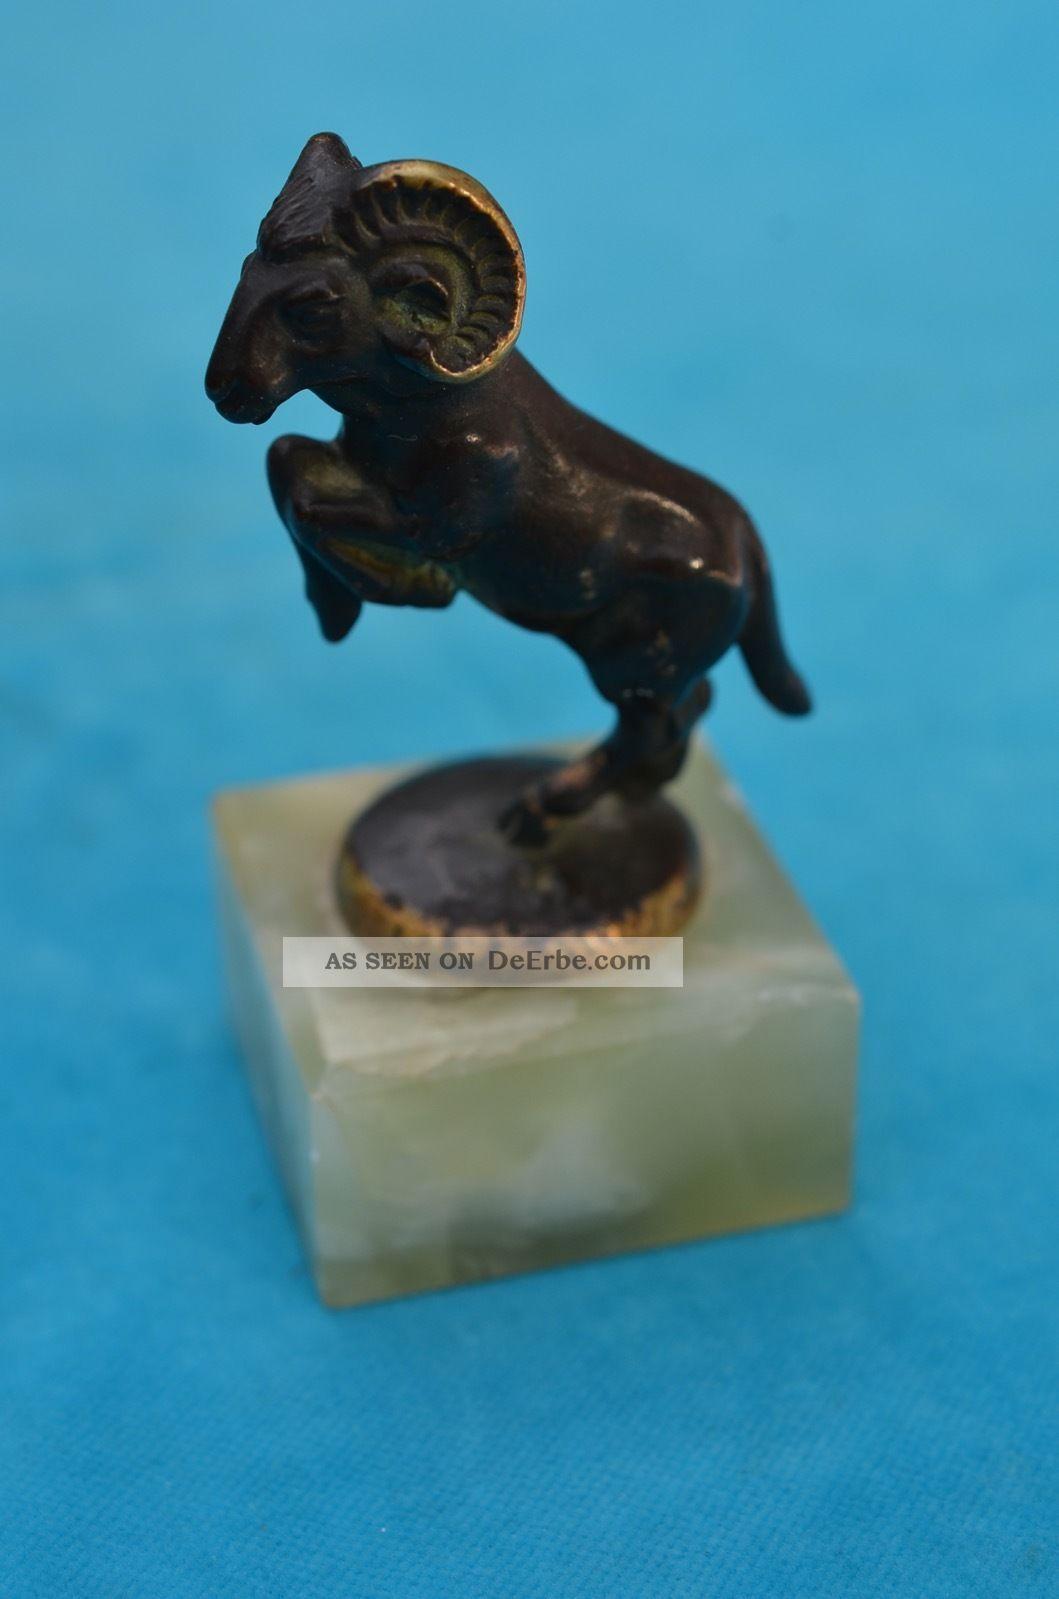 Altes Widder Modell Aus Bronze Schön Naturgetreu Bronze Bild